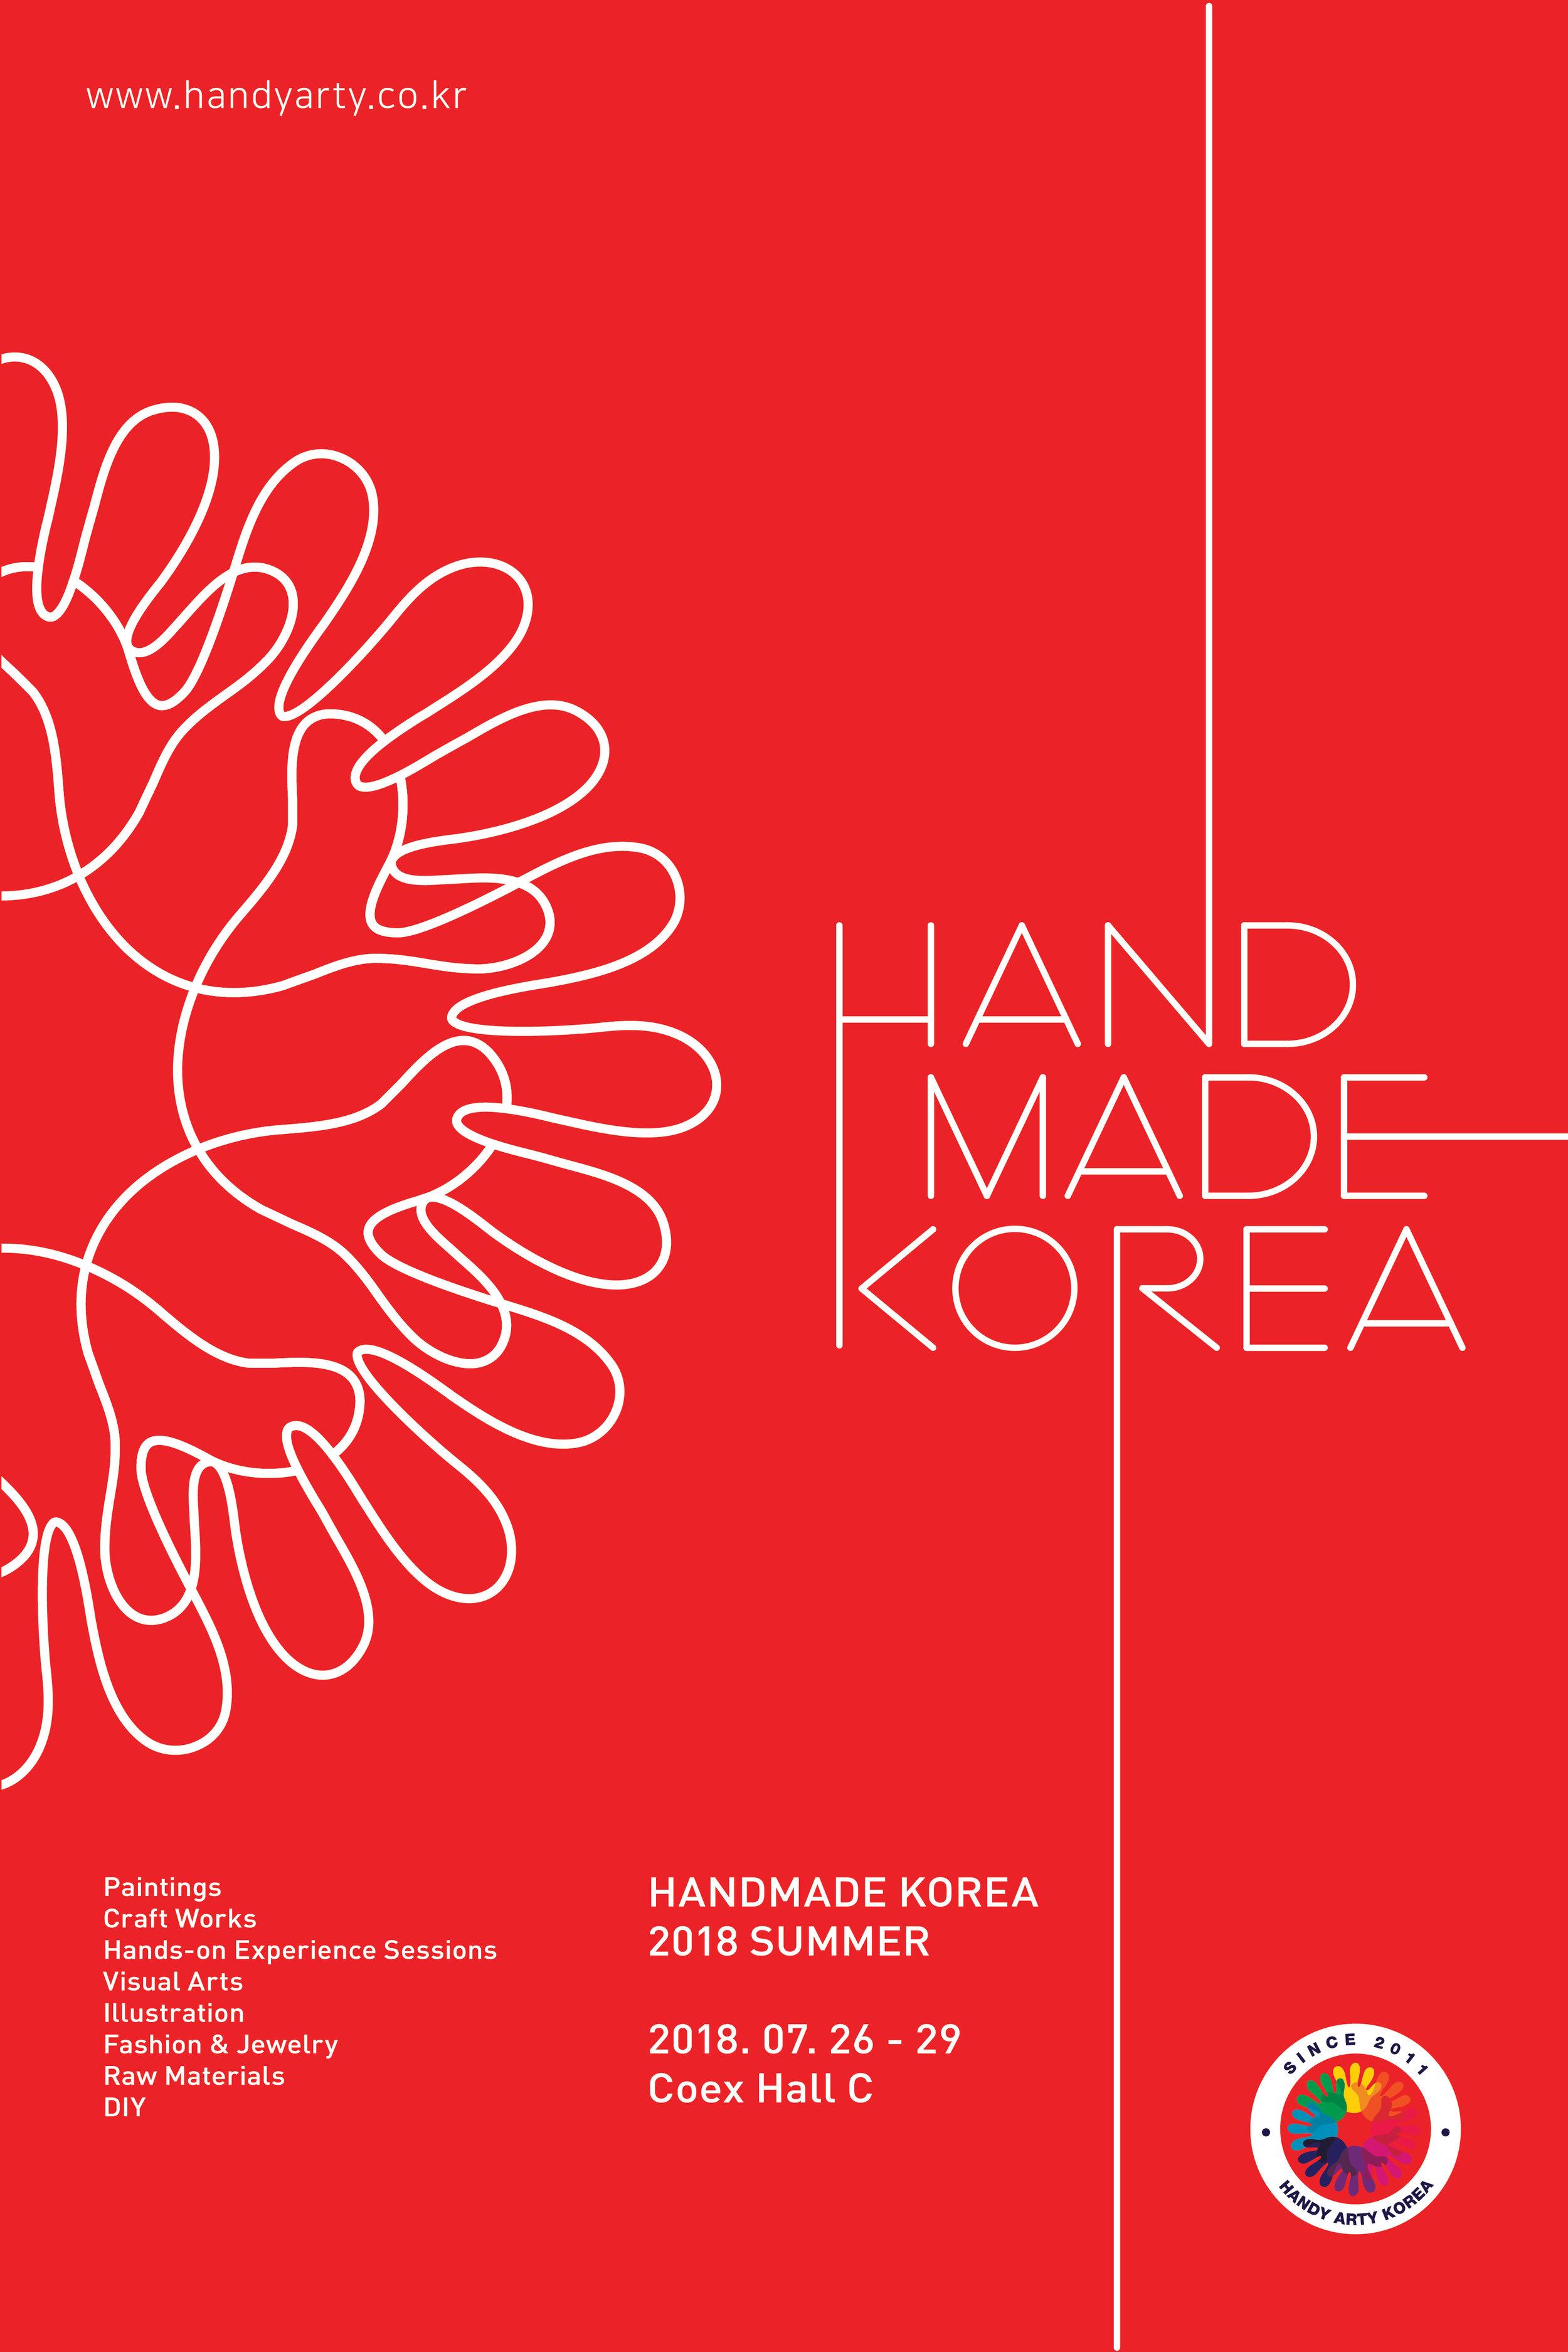 Handmade Korea 2018 - Venue: COEX Convention & Exhibition Center, Lv.3 - Hall CAddress: 159-9 Samseong 1(il)-dong, Seoul - South KoreaDate: 26 - 29 July 2018Booth: H111♦️ Read my blog diary about: Meet The World Through Handmade Korea